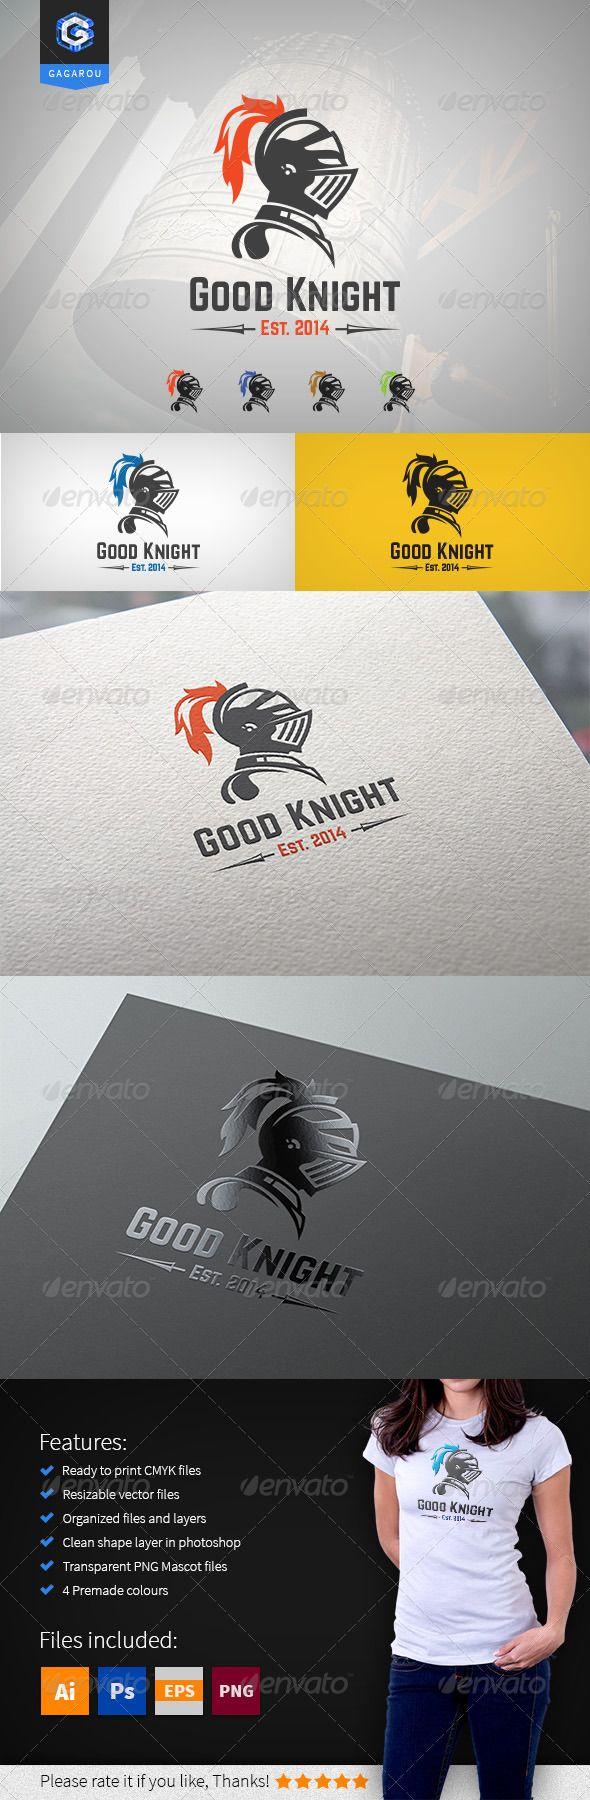 Good Knight logo — Photoshop PSD #helmet #sport • Available here → https://graphicriver.net/item/good-knight-logo/8351359?ref=pxcr